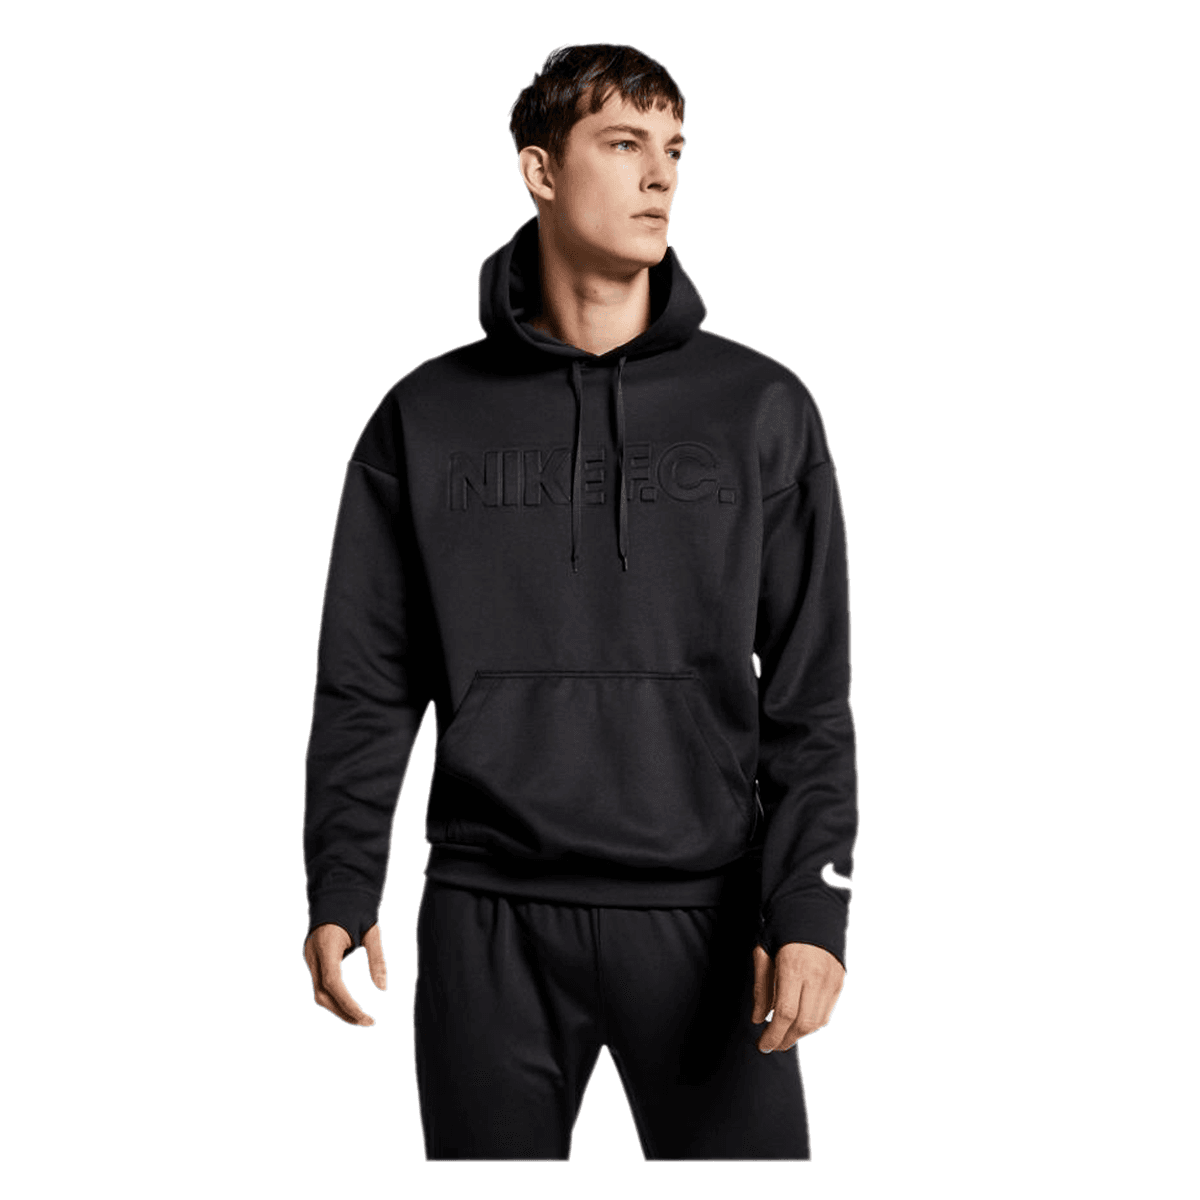 Nike Kapuzenpullover F.C. Football Hoody schwarzweiß